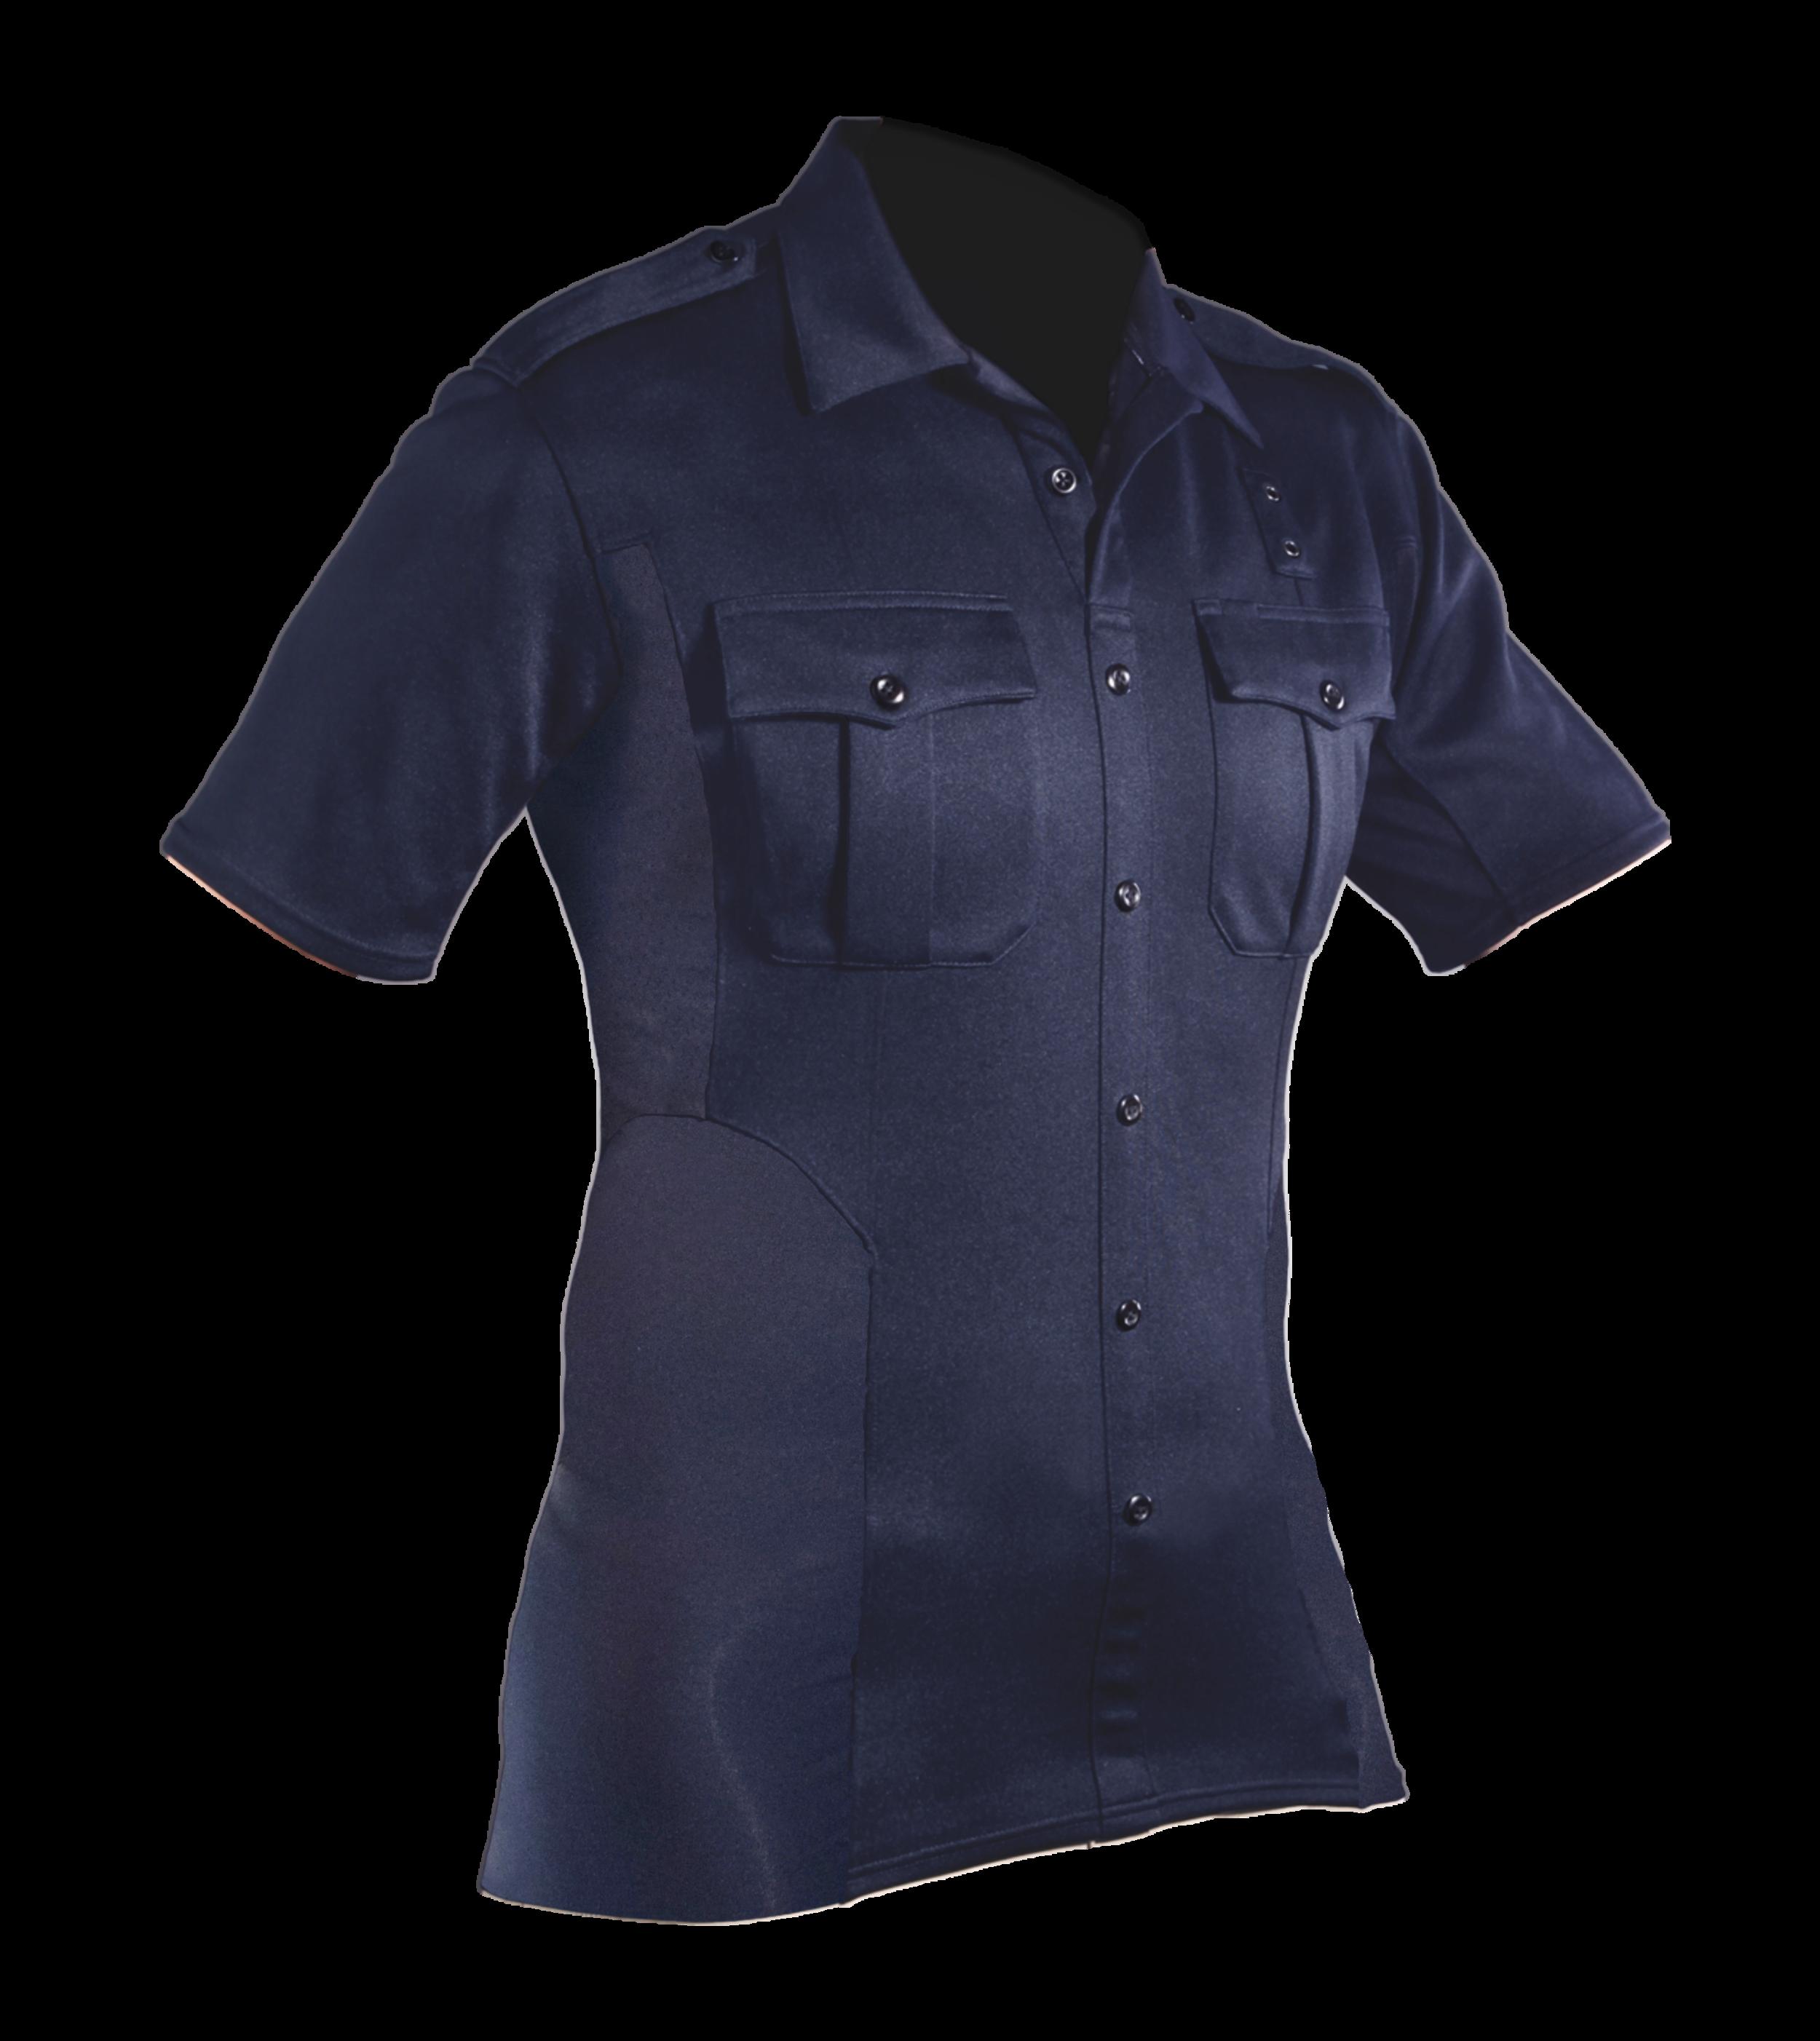 NAVY_UNIFORM-Short Sleeve.png